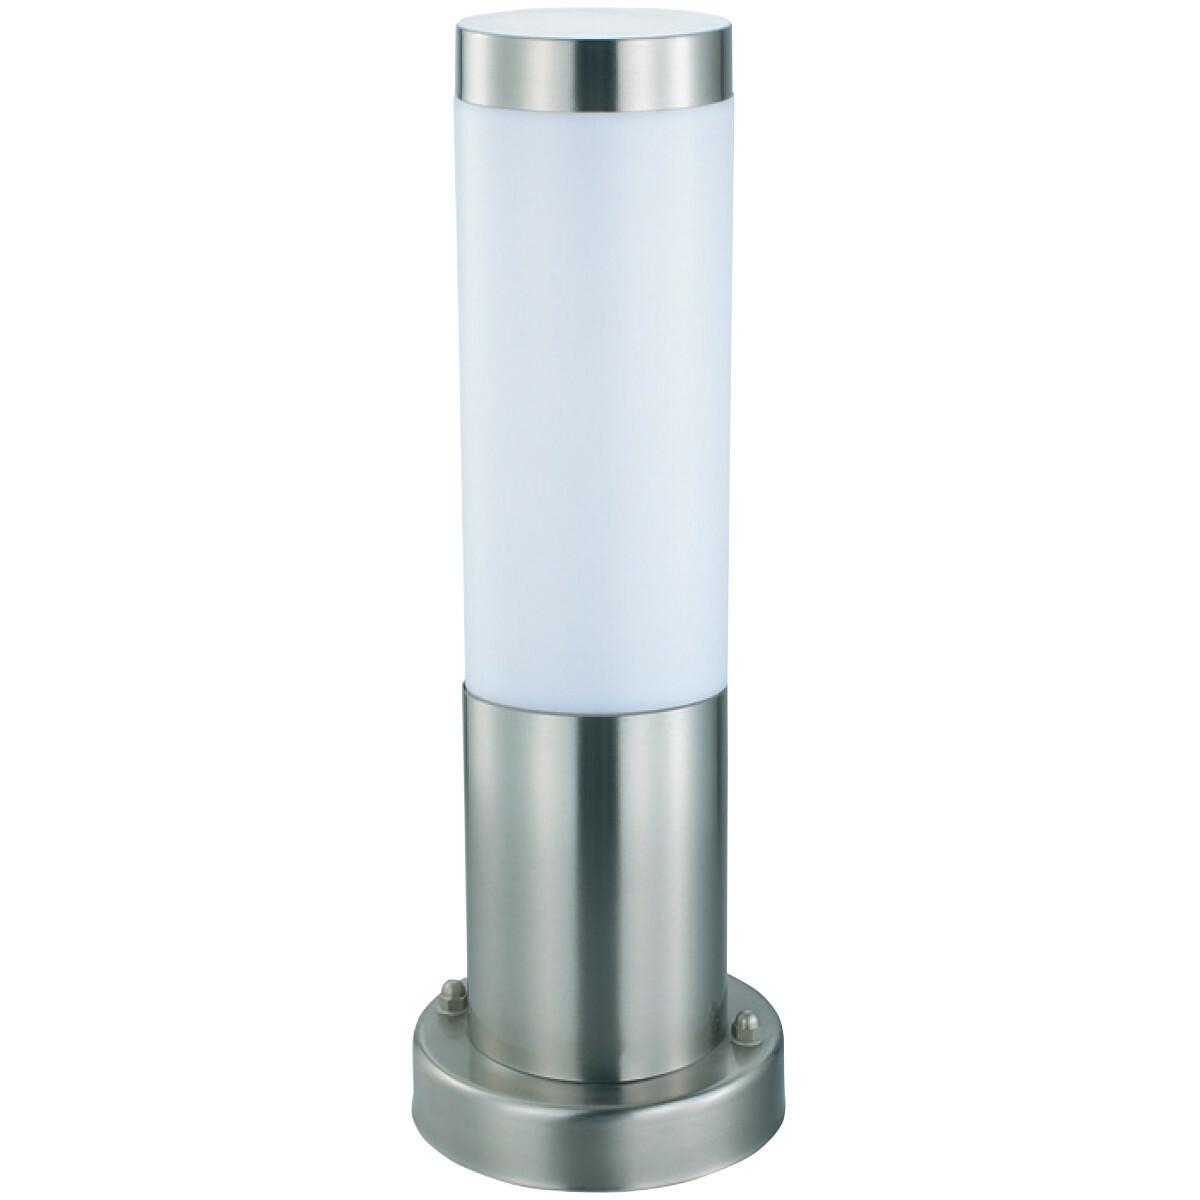 PHILIPS - LED Tuinverlichting - Staande Buitenlamp - CorePro Lustre 827 P45 FR - Laurea 3 - E27 Fitt